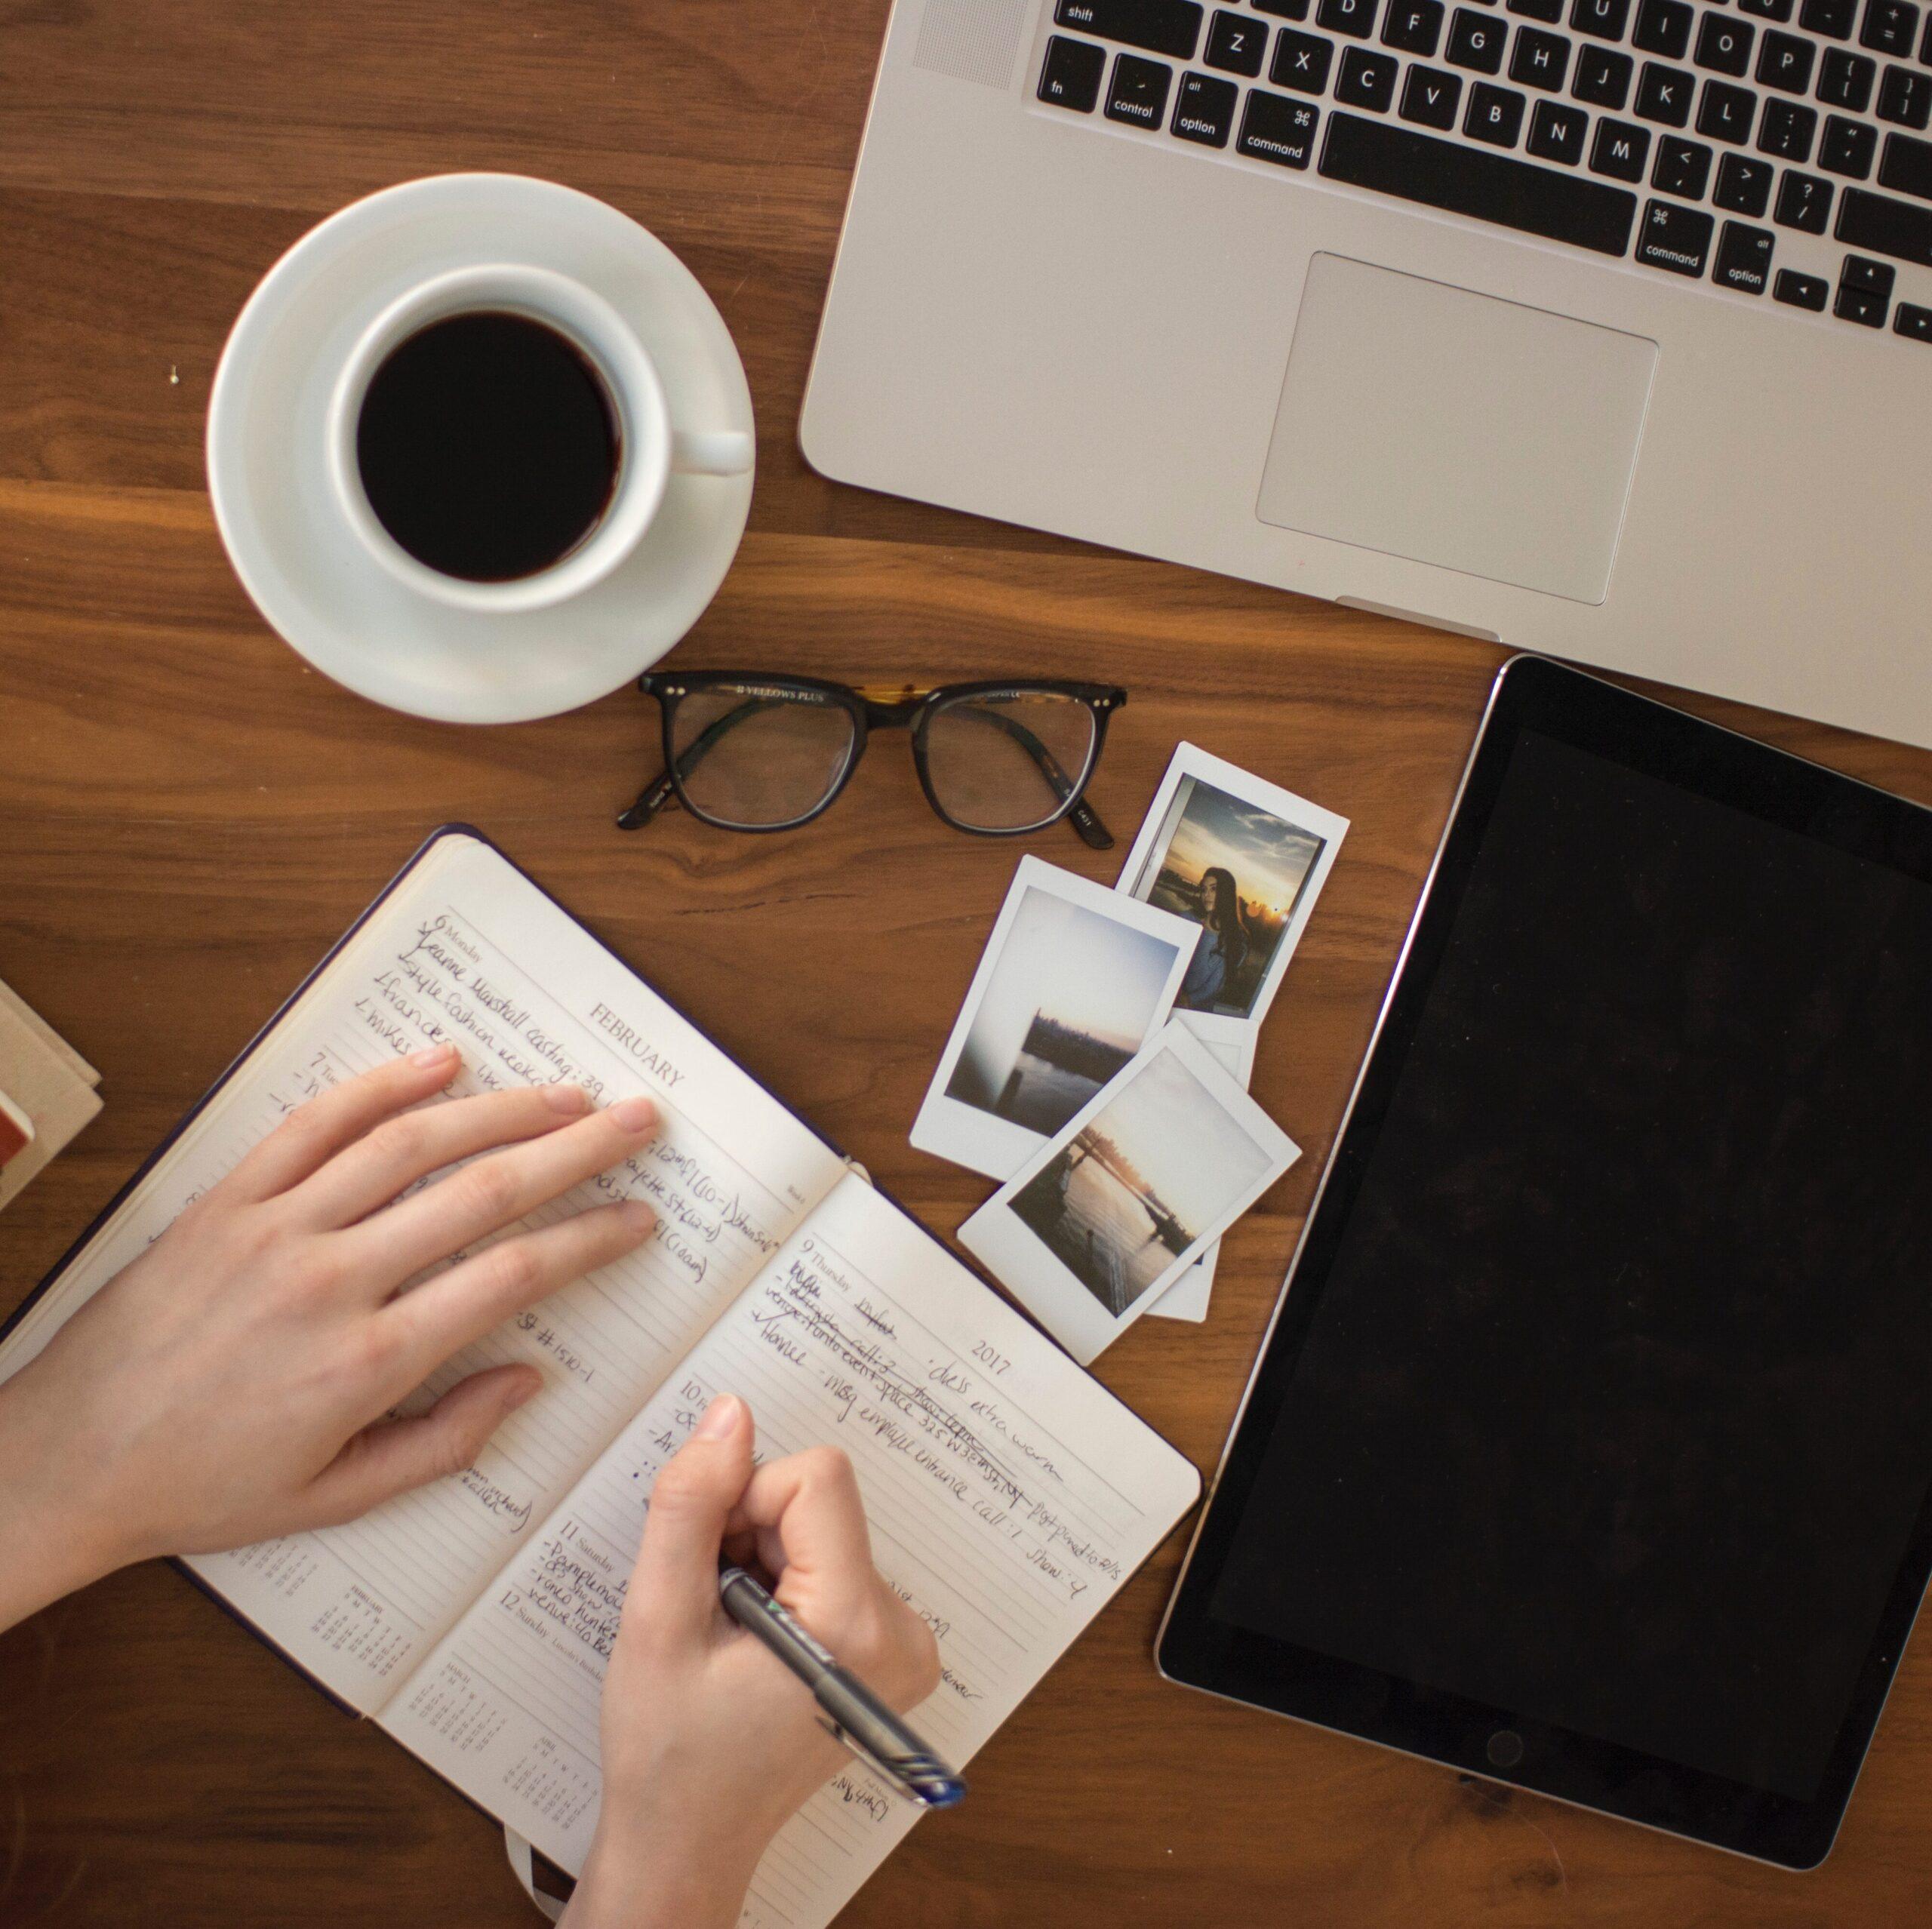 marketing oraklet, kompetencer, marketing, markedsføring